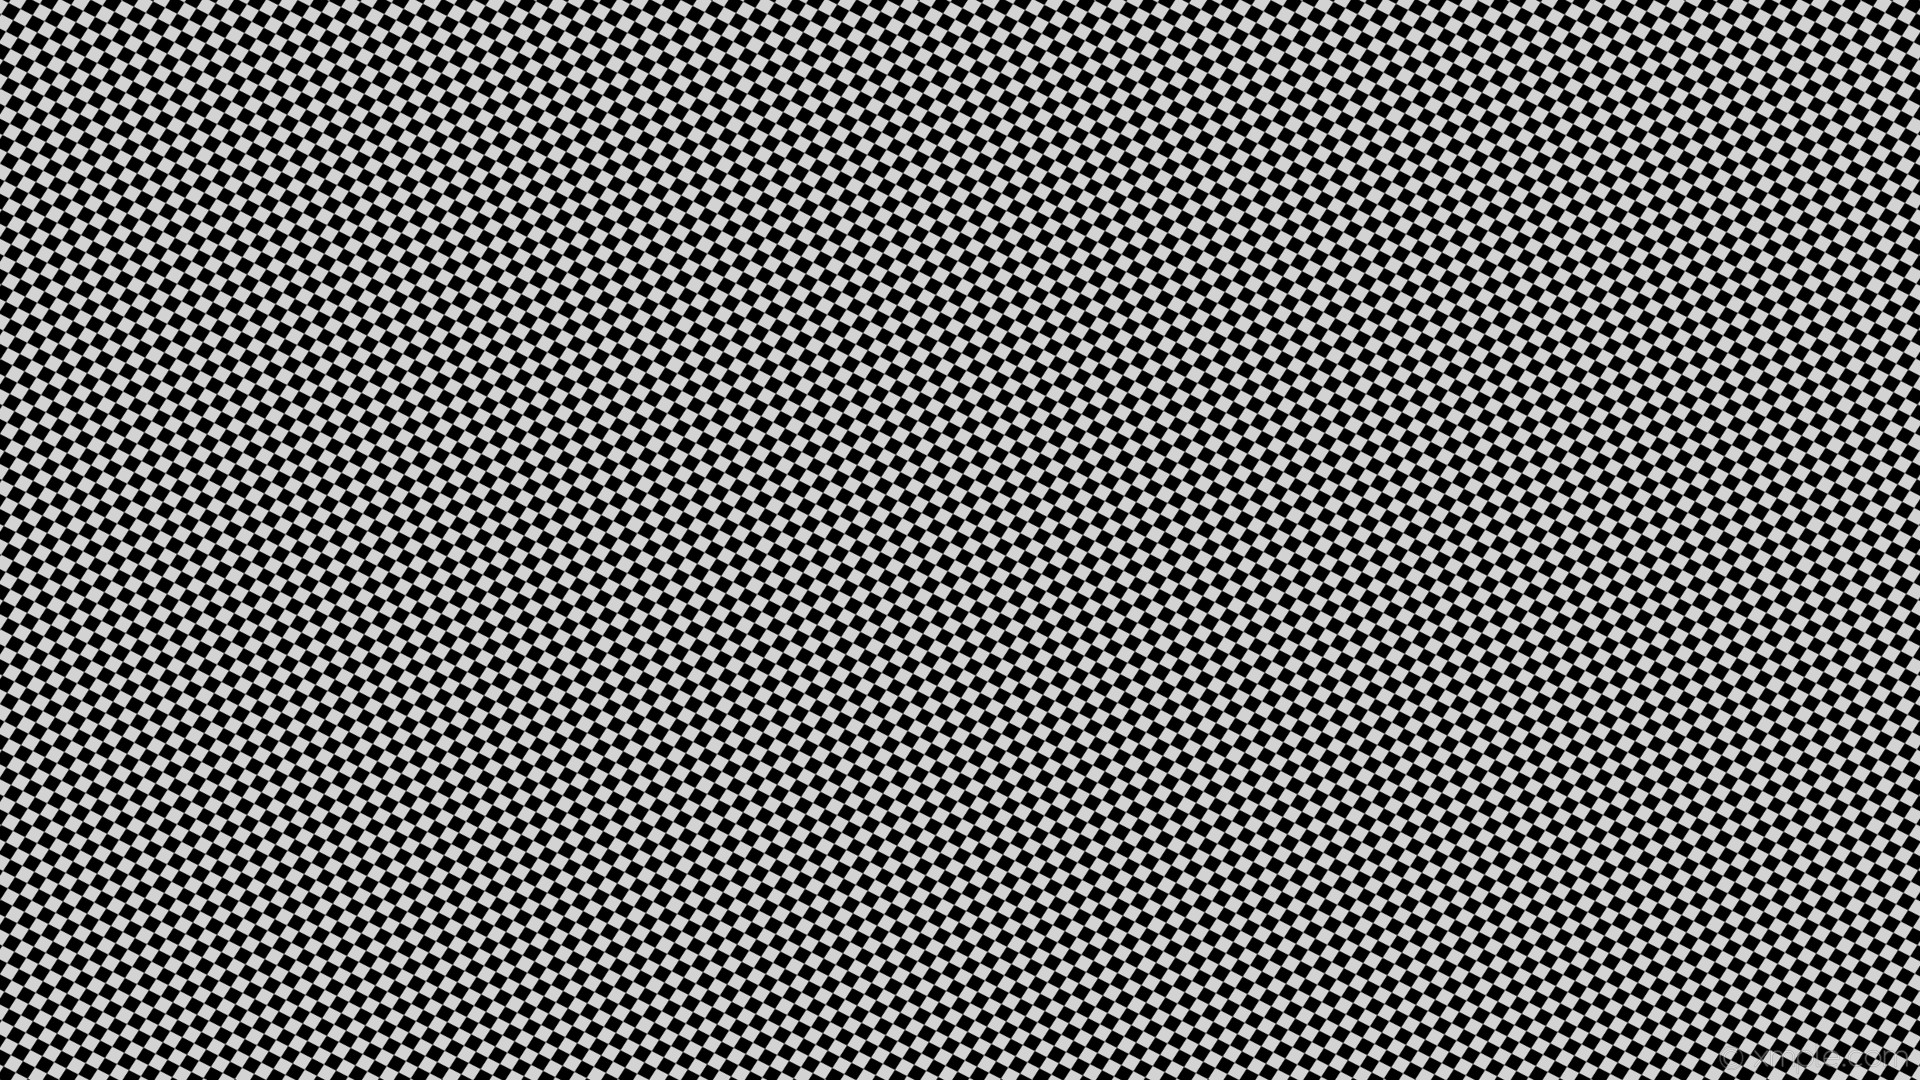 Res: 1920x1080, wallpaper rhombus grey black diamond lozenge light gray #000000 #d3d3d3 15°  20px 18px